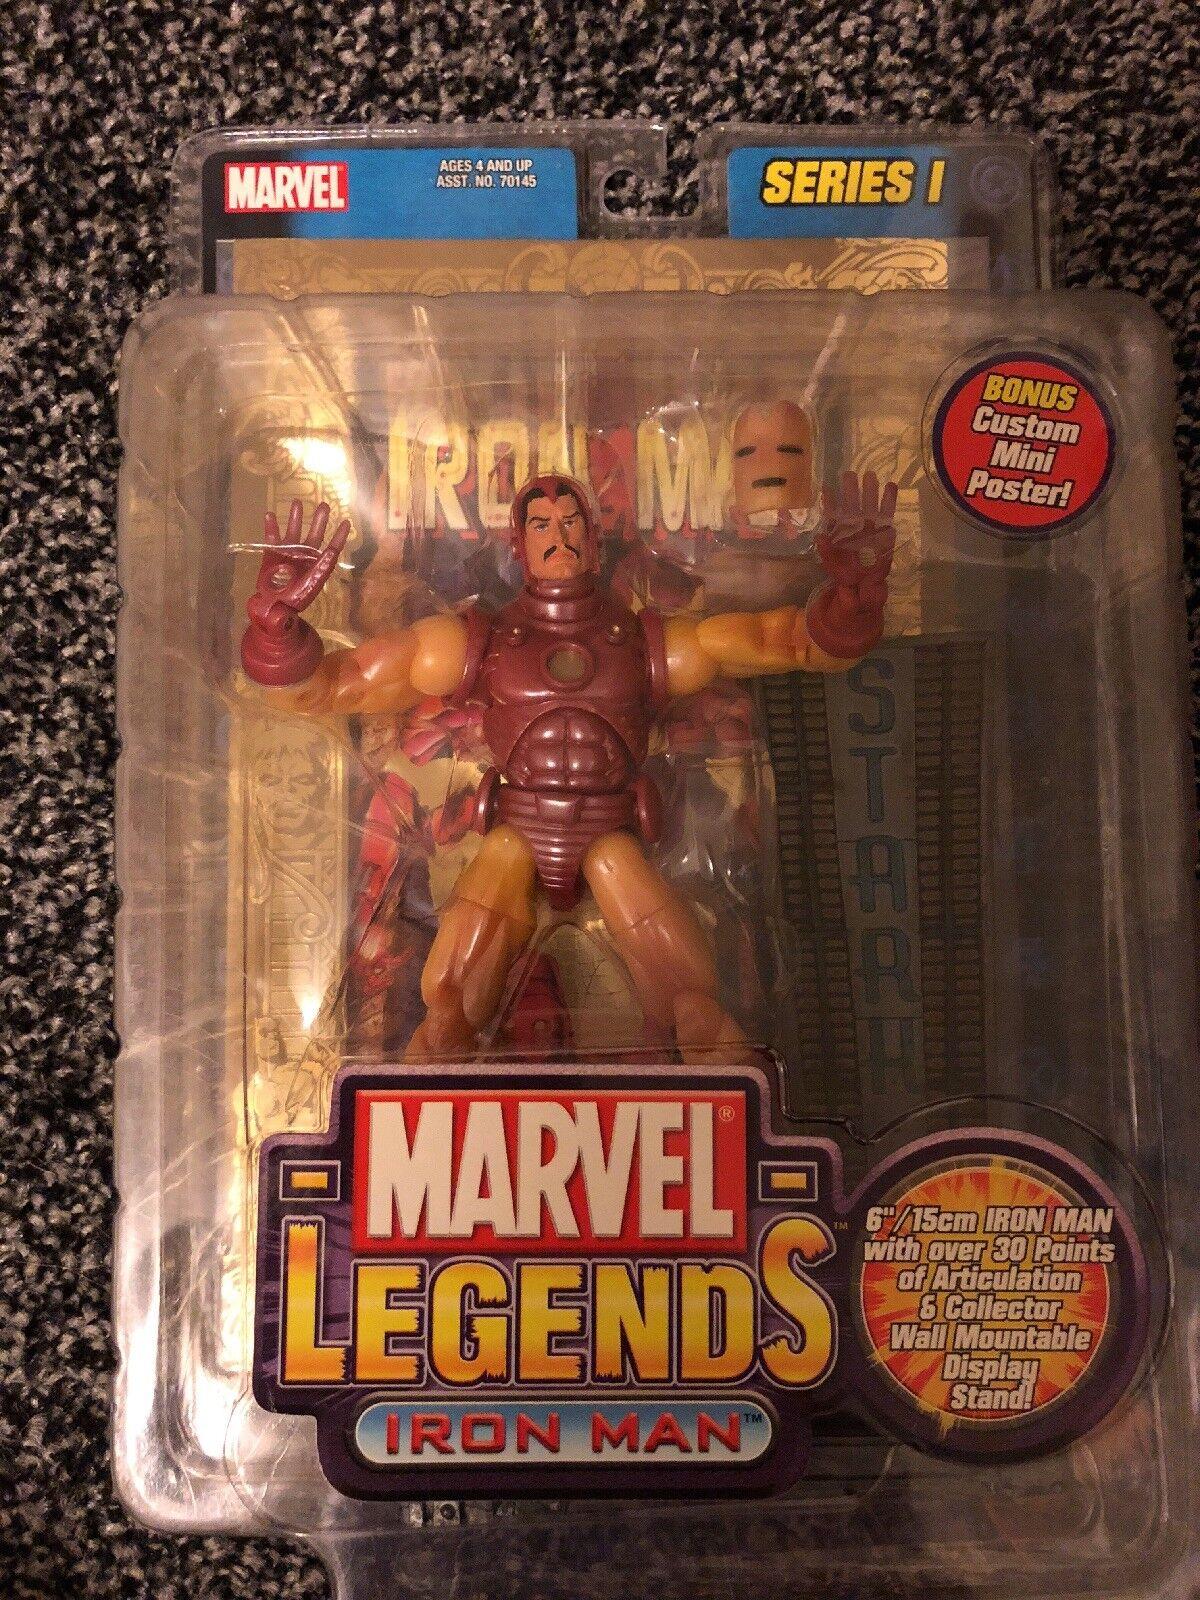 Marvel - legenden ironman - reihe 1, abbildung